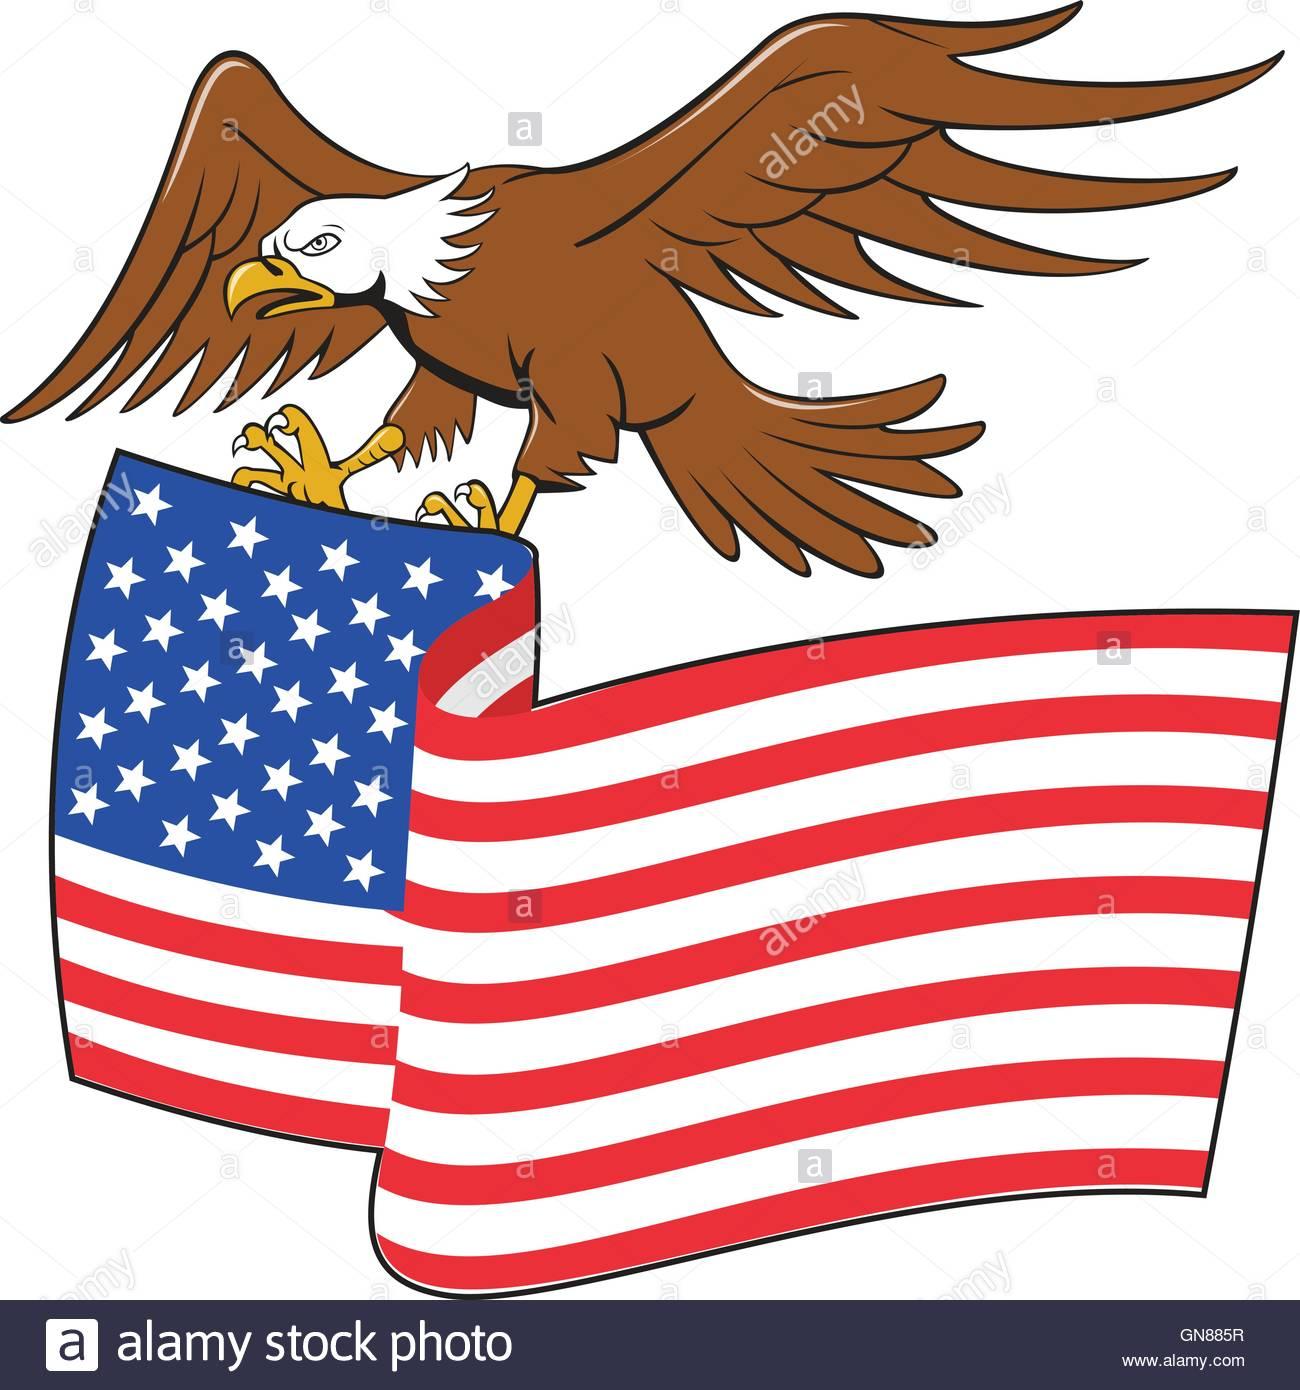 1300x1390 American Bald Eagle Carrying Usa Flag Cartoon Stock Vector Art